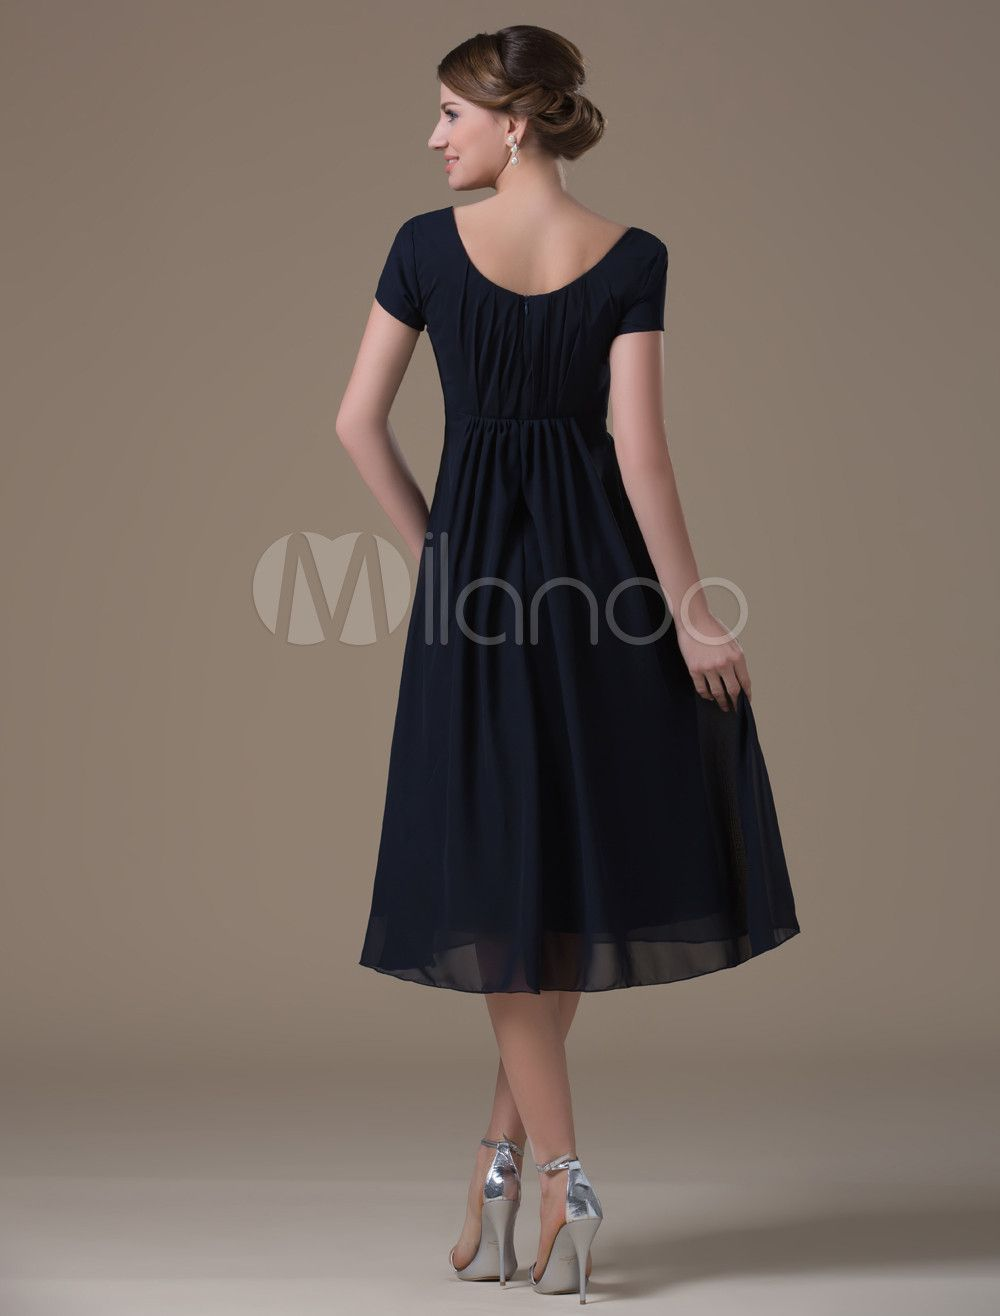 a2ff3a035b A-line Dark Navy Chiffon Maternity Bridesmaid Dress with Jewel Neck High  Rise Waist  Chiffon